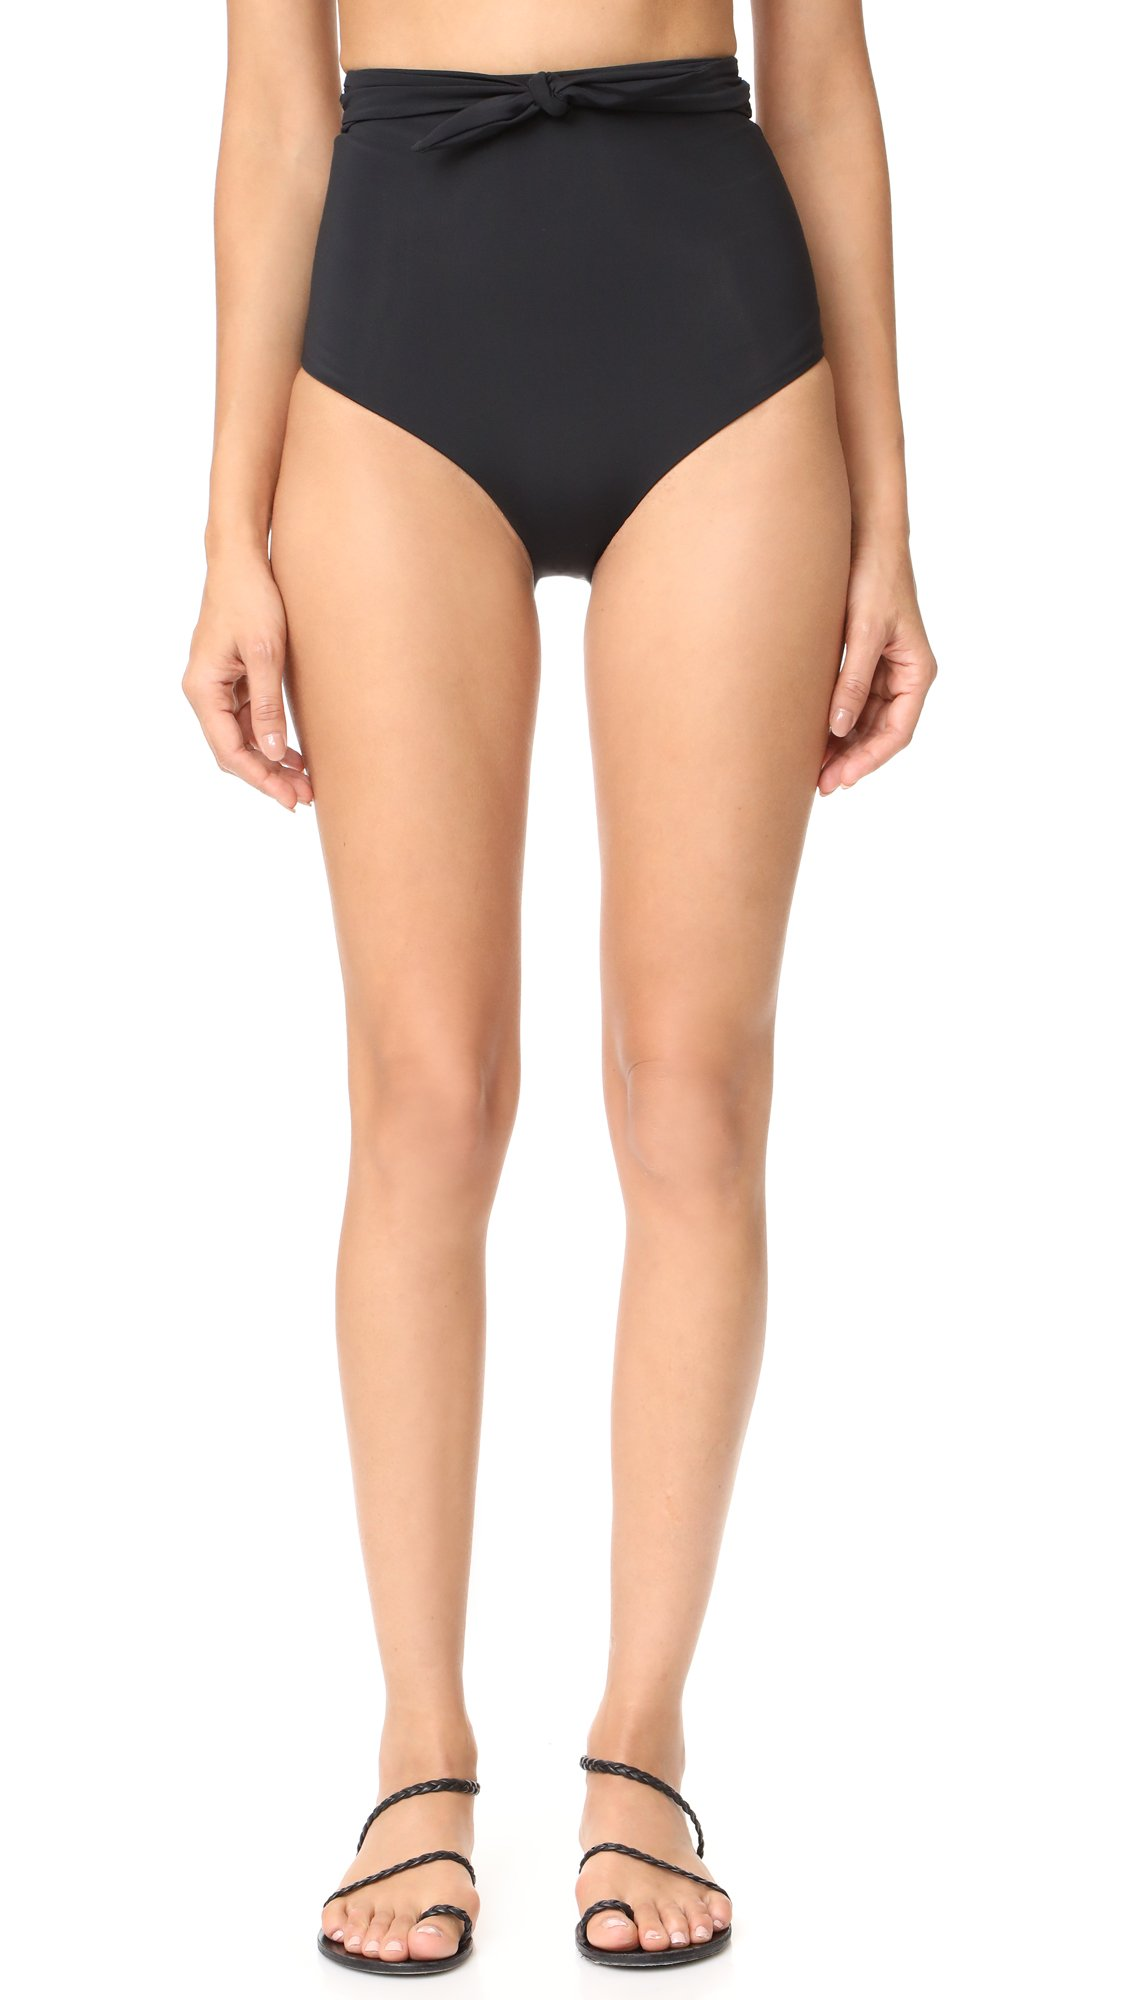 Mara Hoffman Women's Jay Bikini Bottom, Black, M